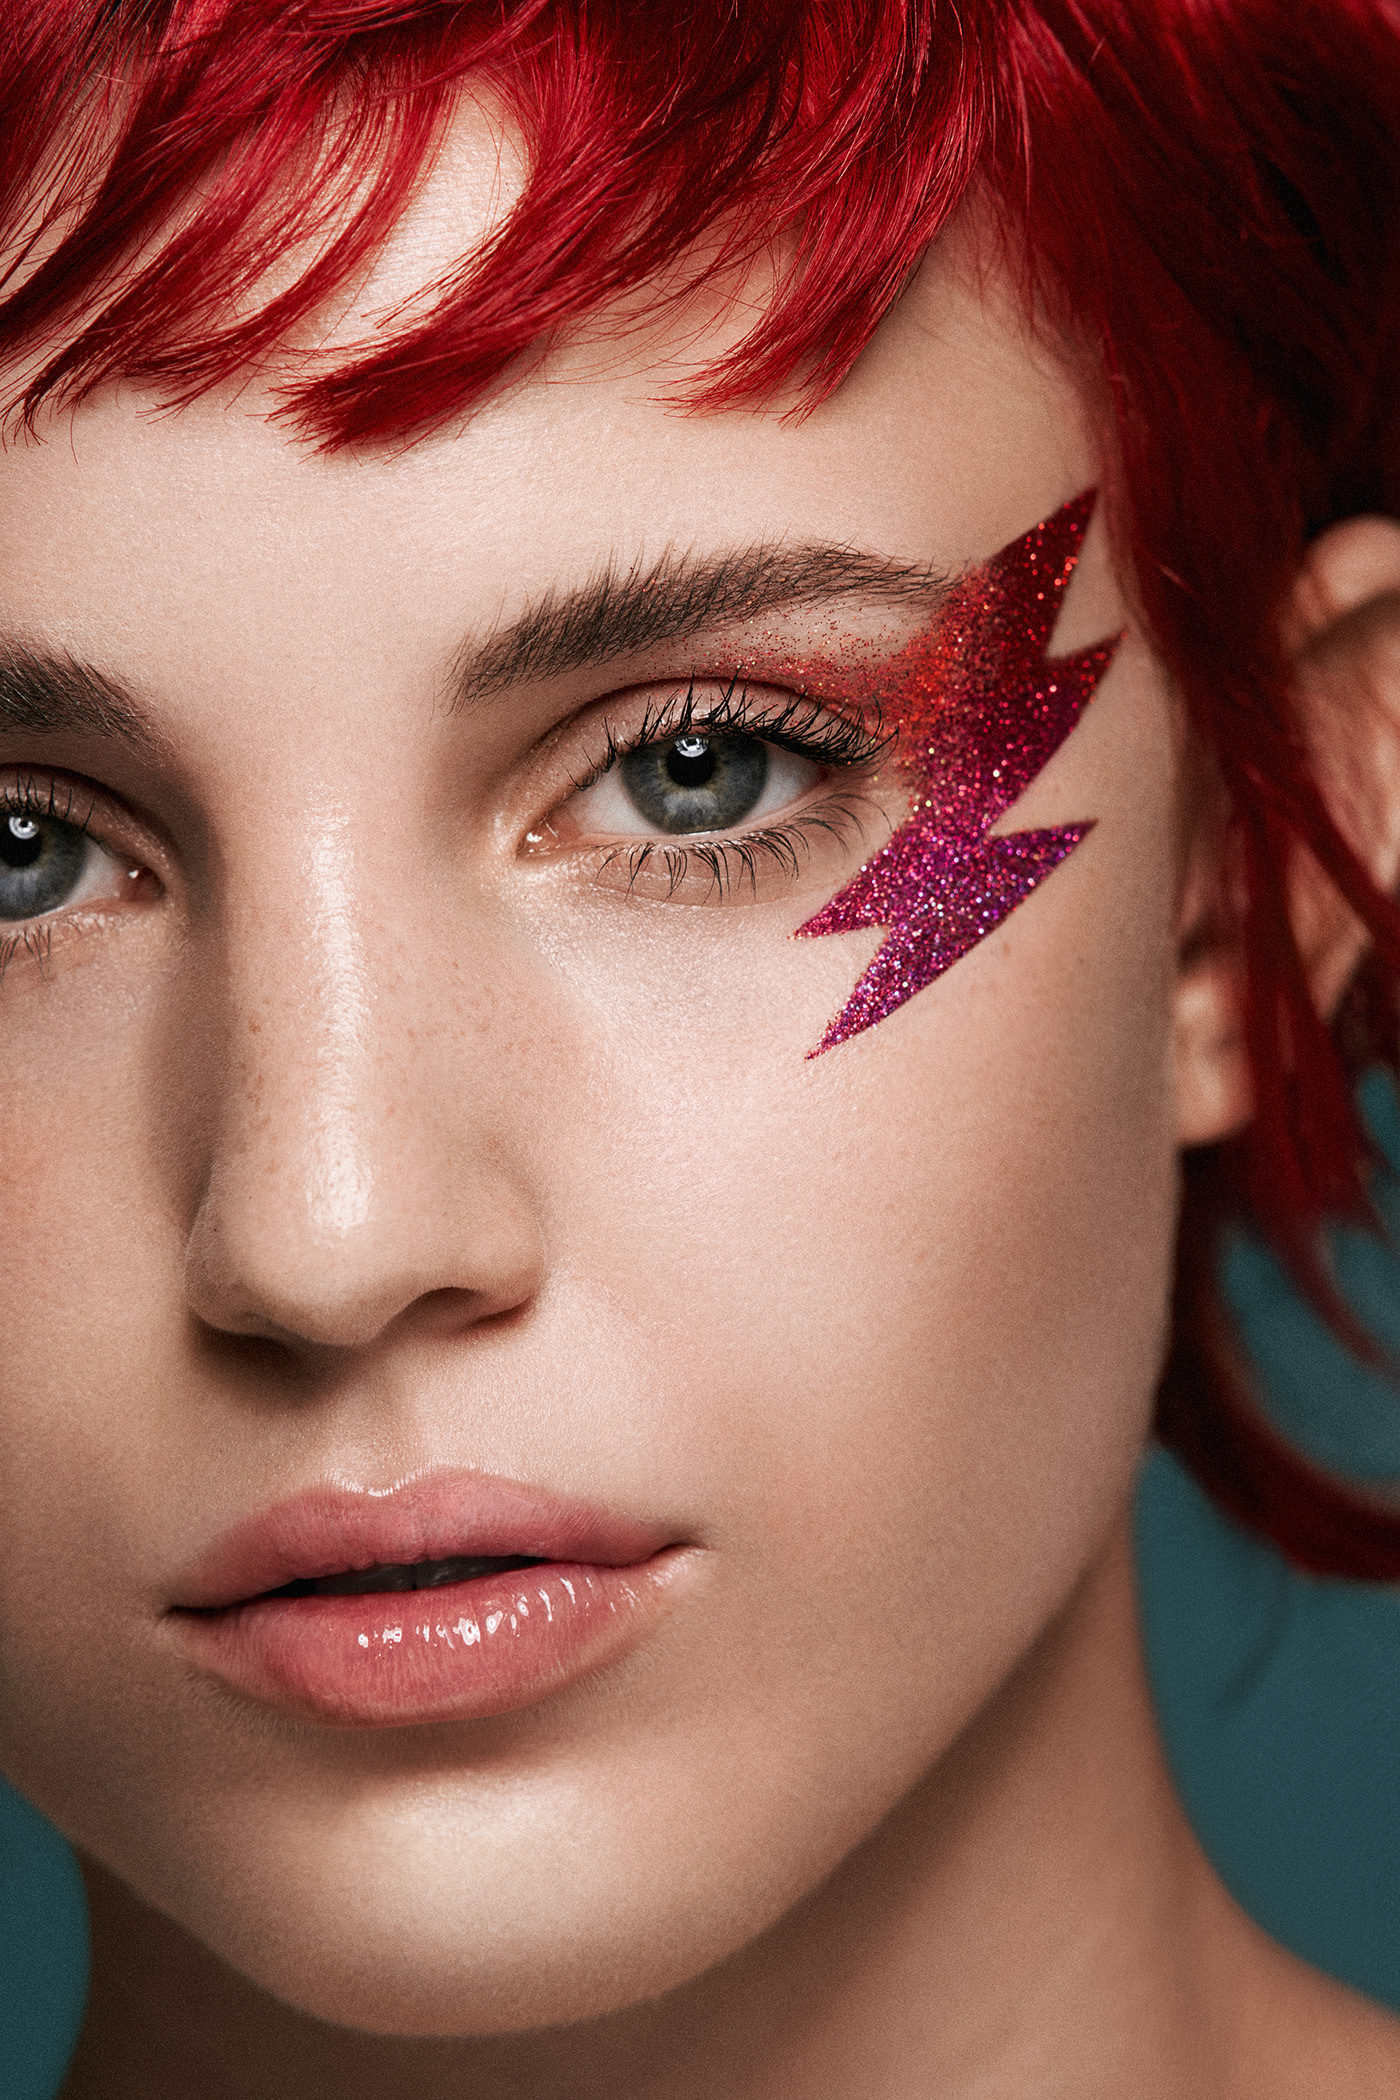 beauty closeup editorial macro makeup portrait